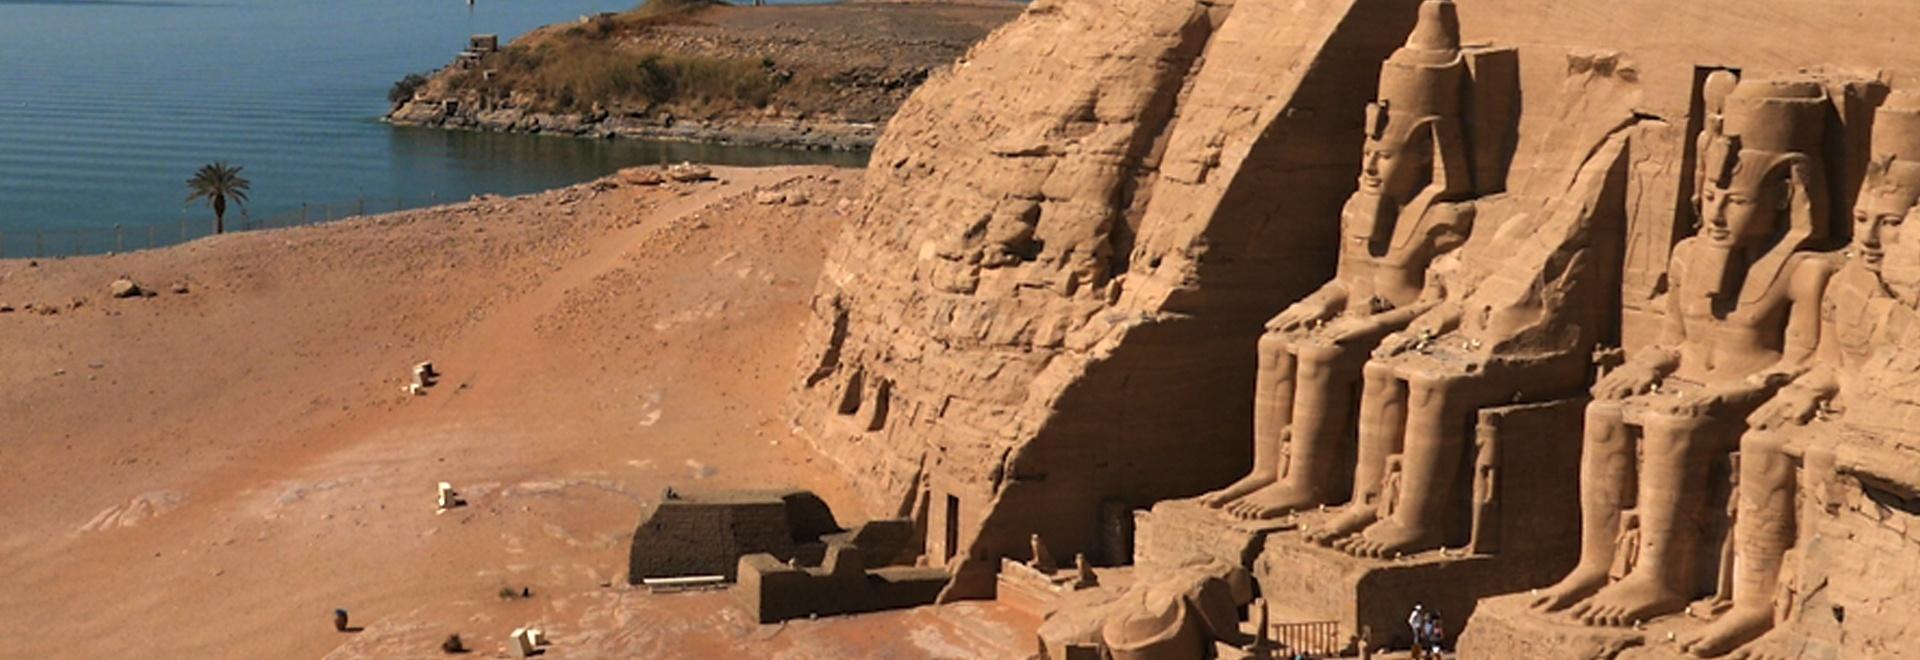 Abu Simbel - Un trasloco faraonico